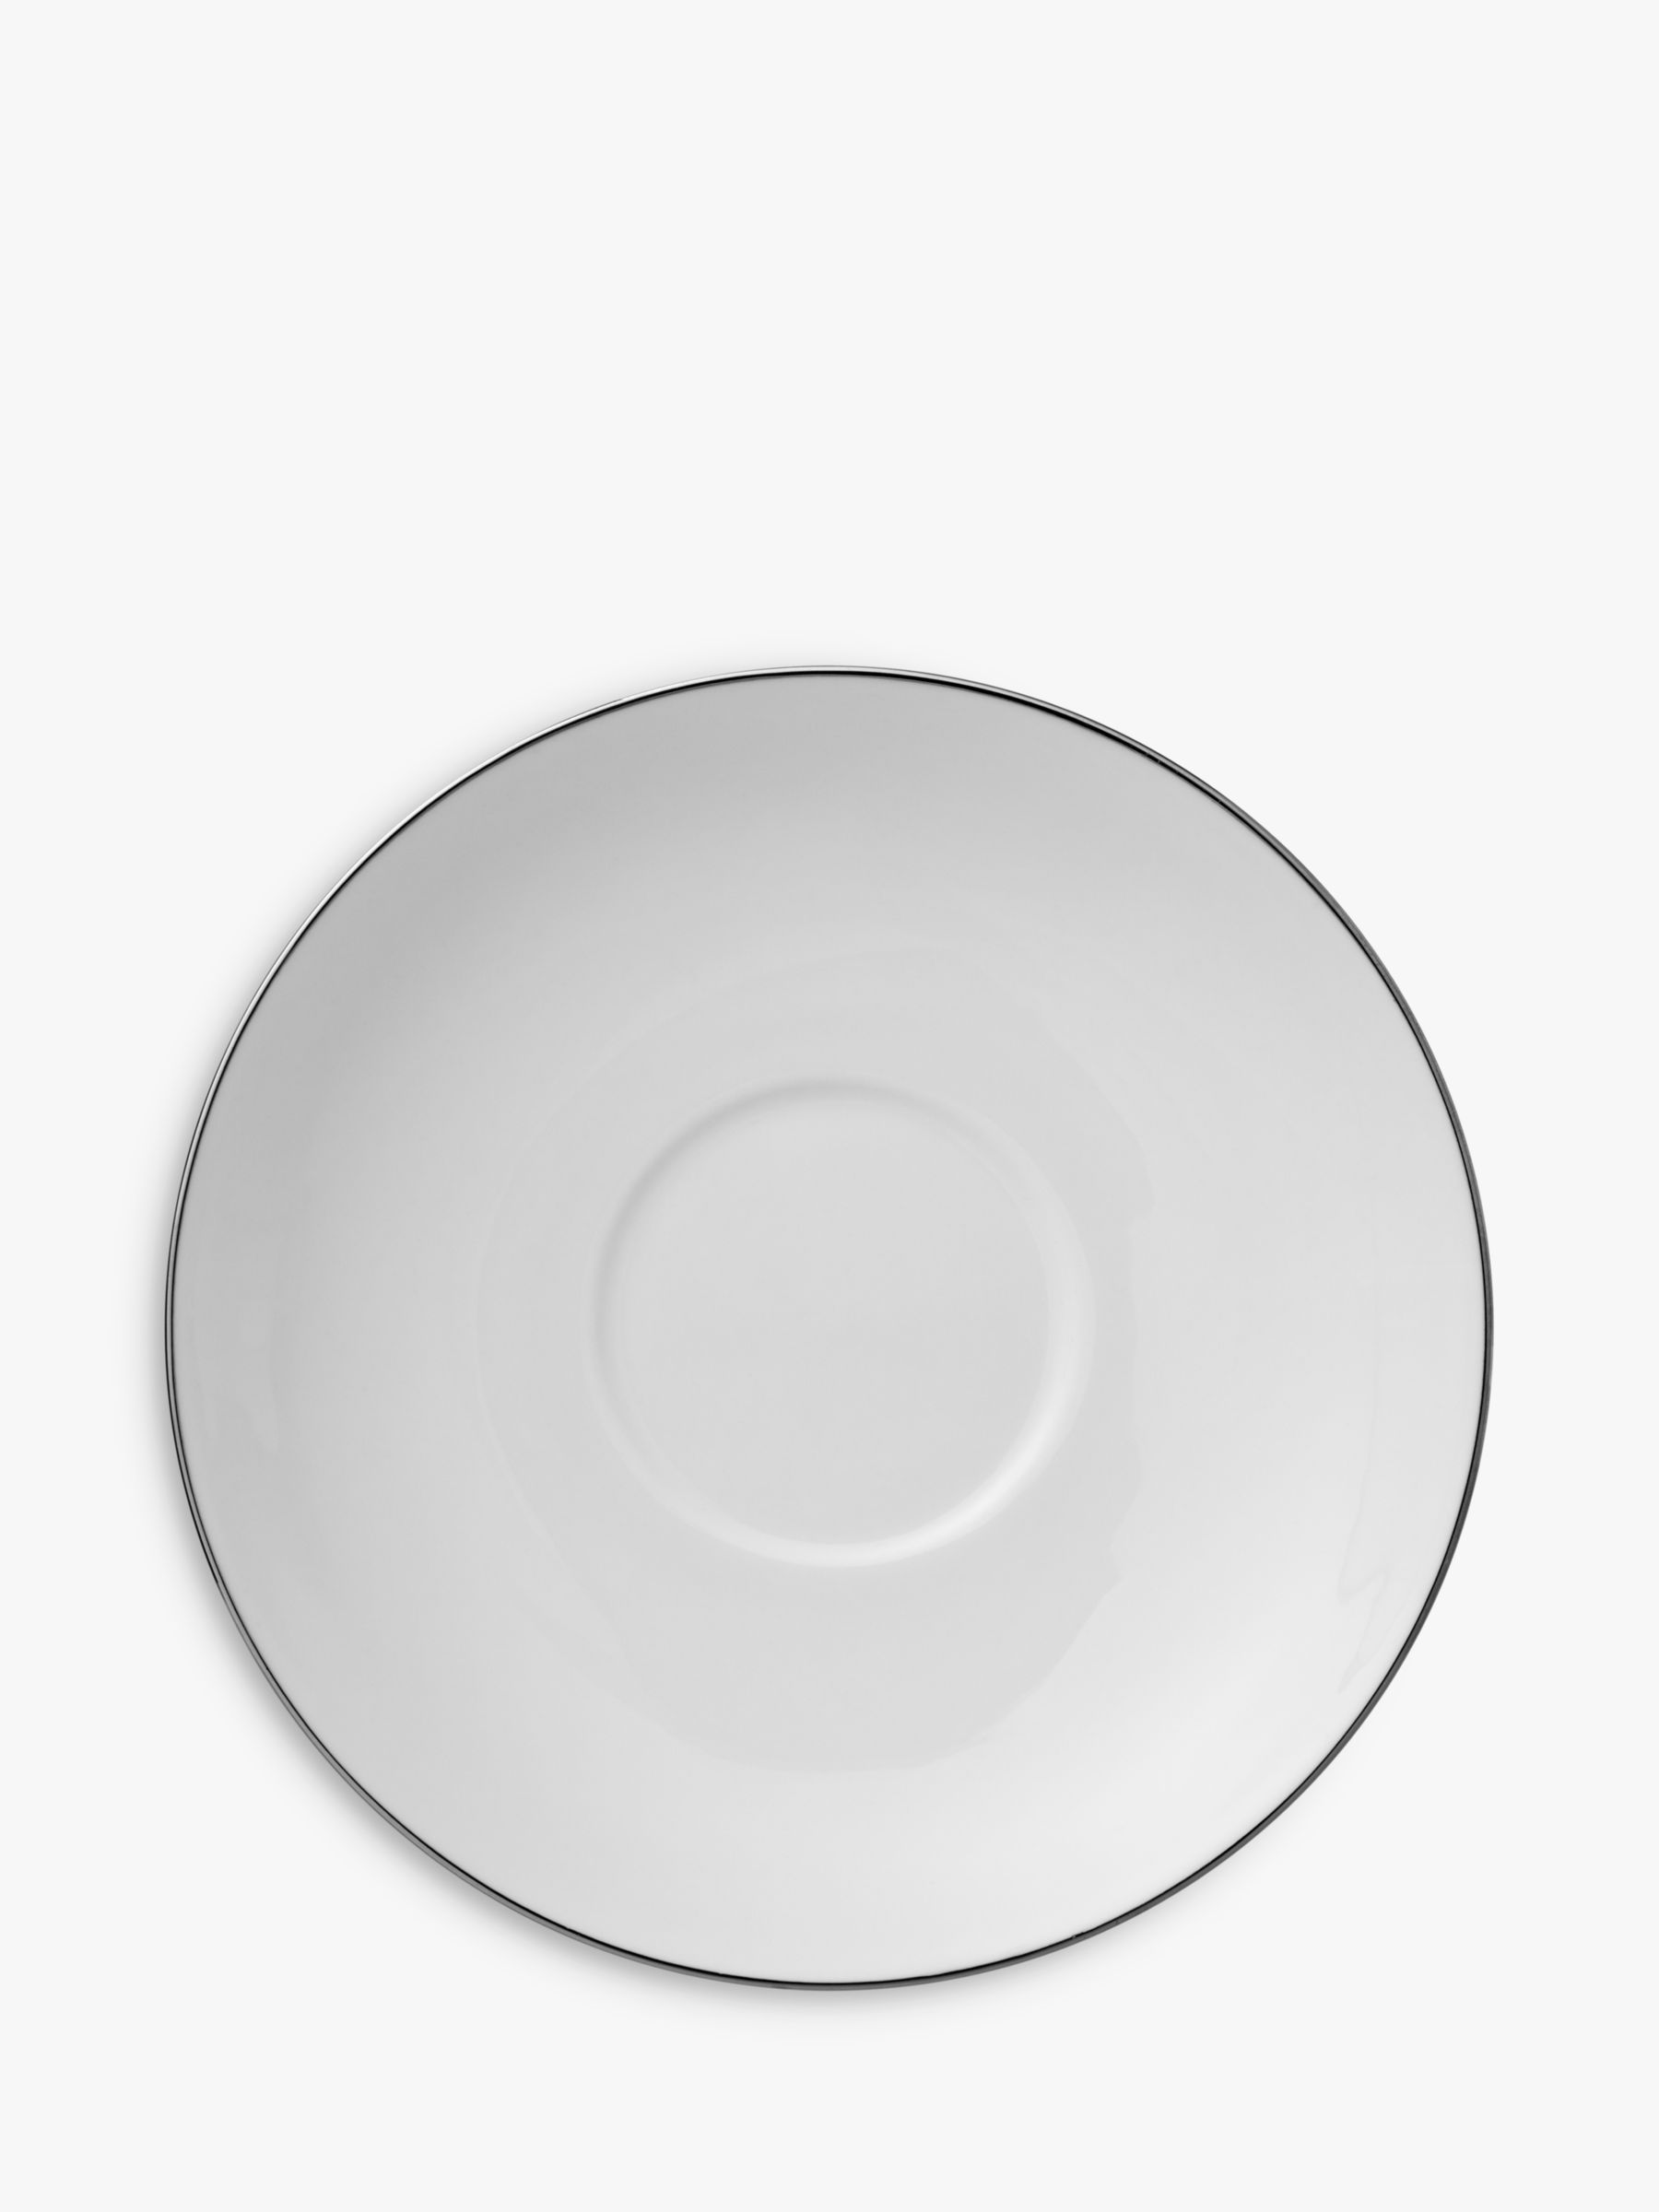 Wedgwood Wedgwood Signet Platinum Tea Saucer, Dia.11.5cm, White